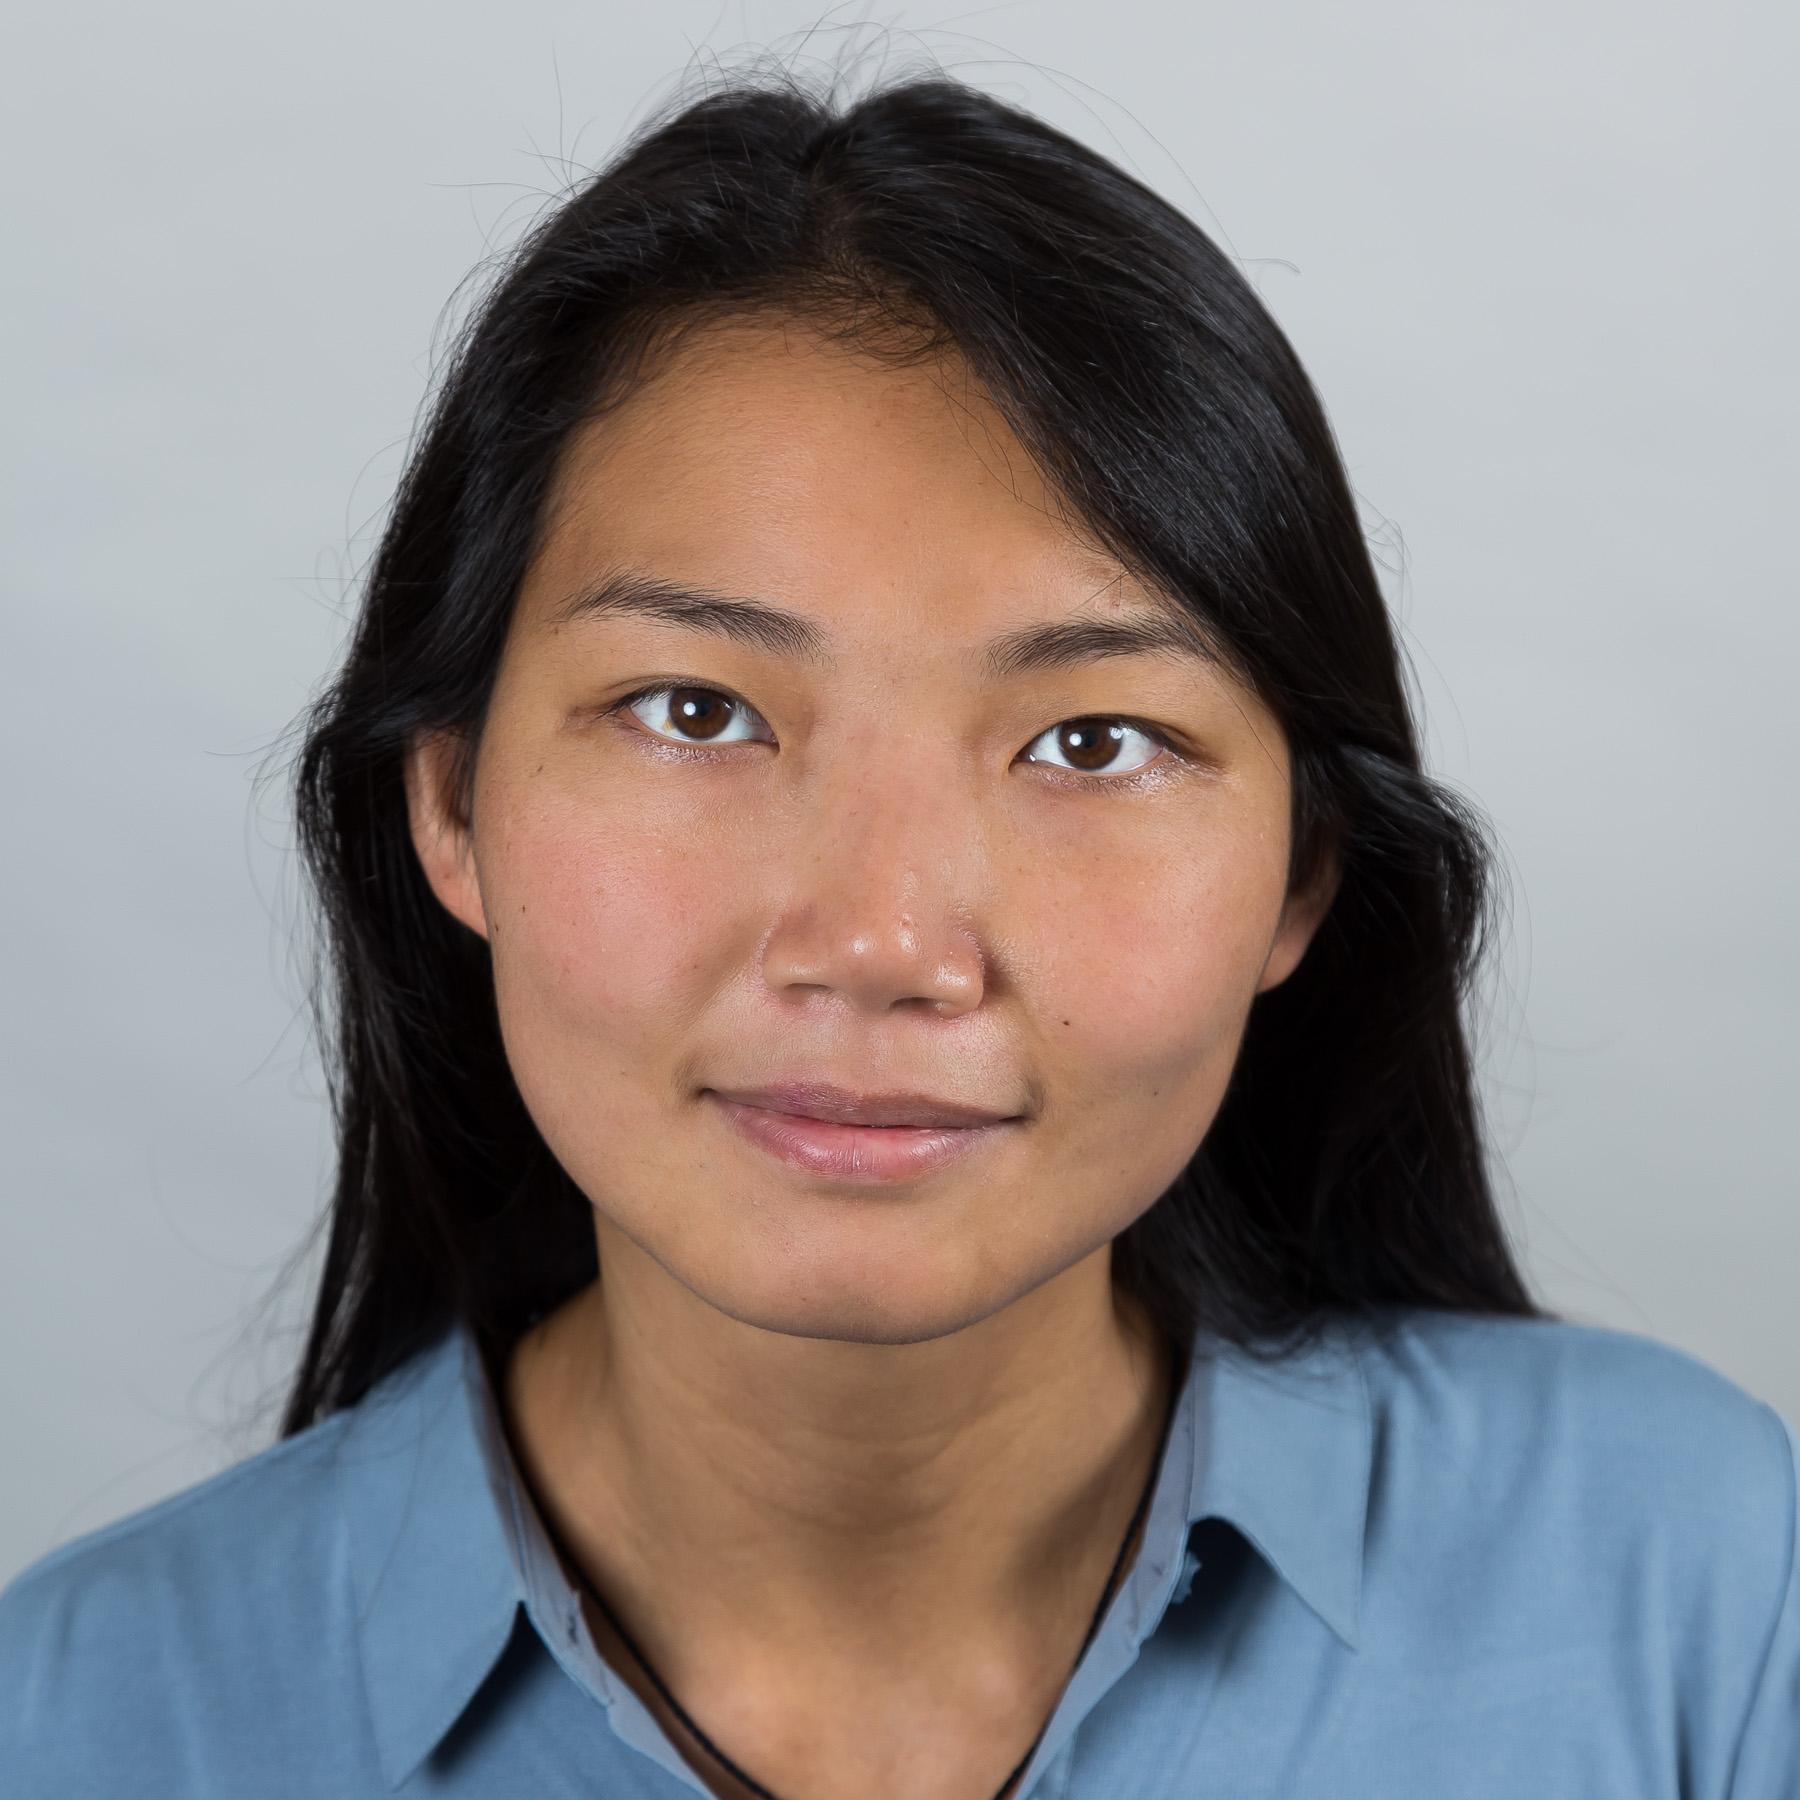 Yang Liao